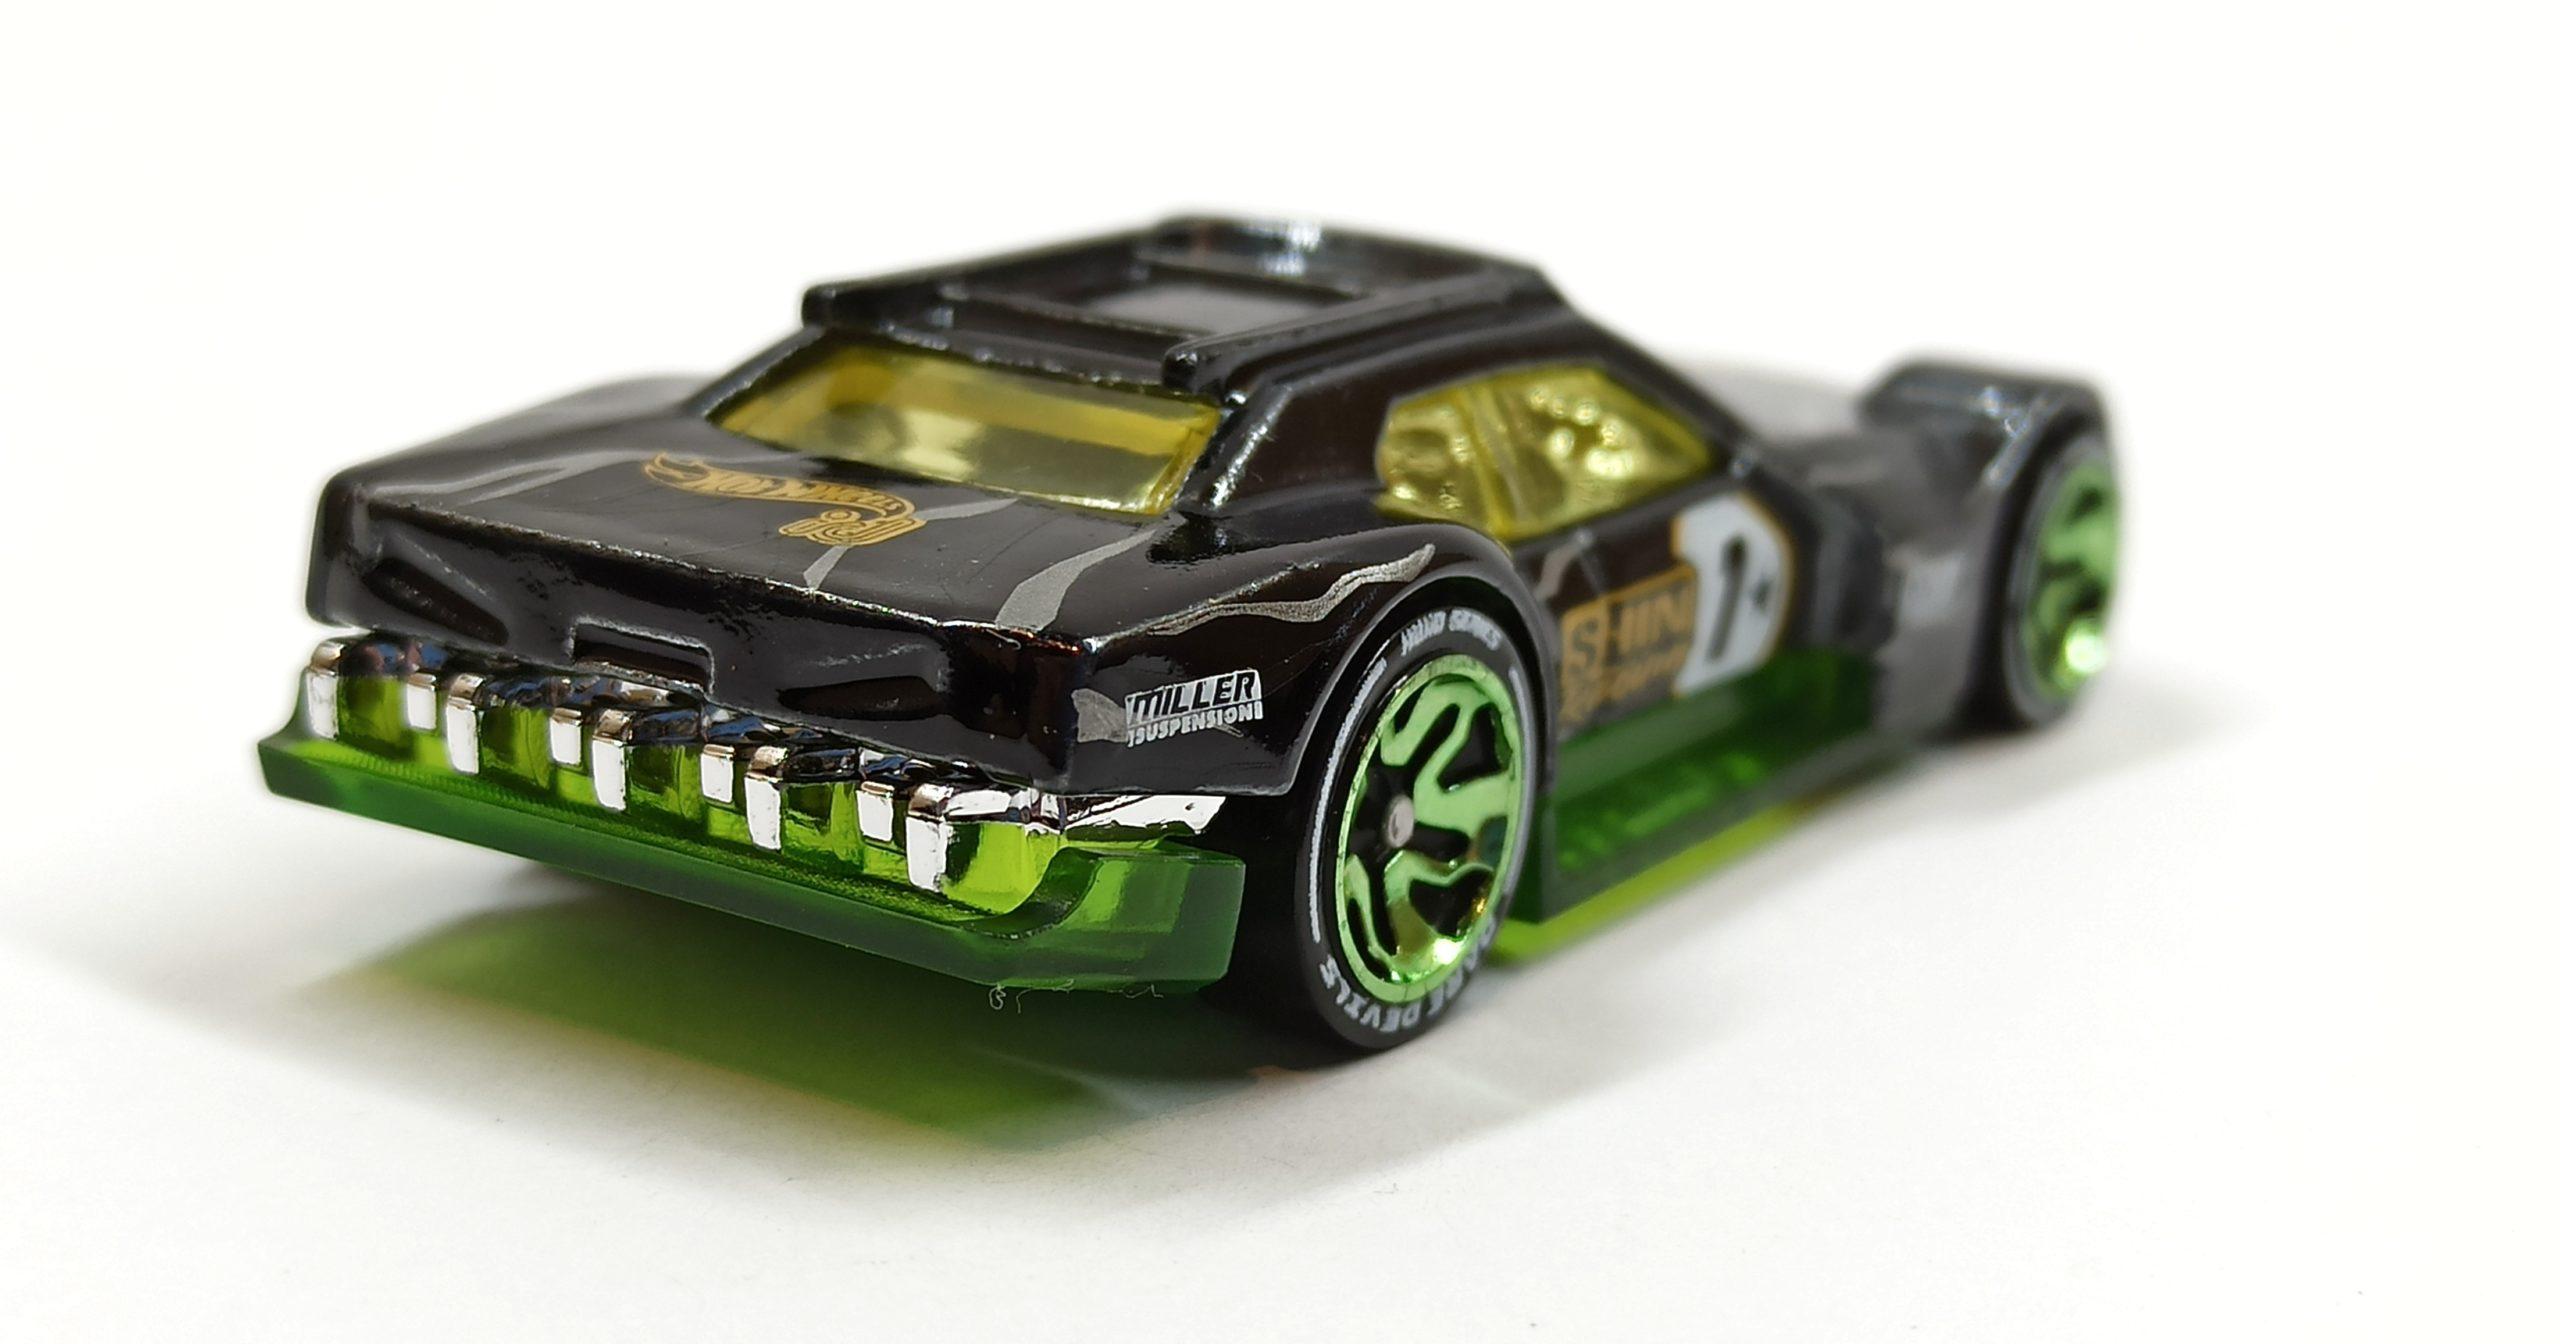 Hot Wheels Driftsta (GML16) 2021 Hot Wheels id: HW Daredevils (2/4) spectraflame black side angle